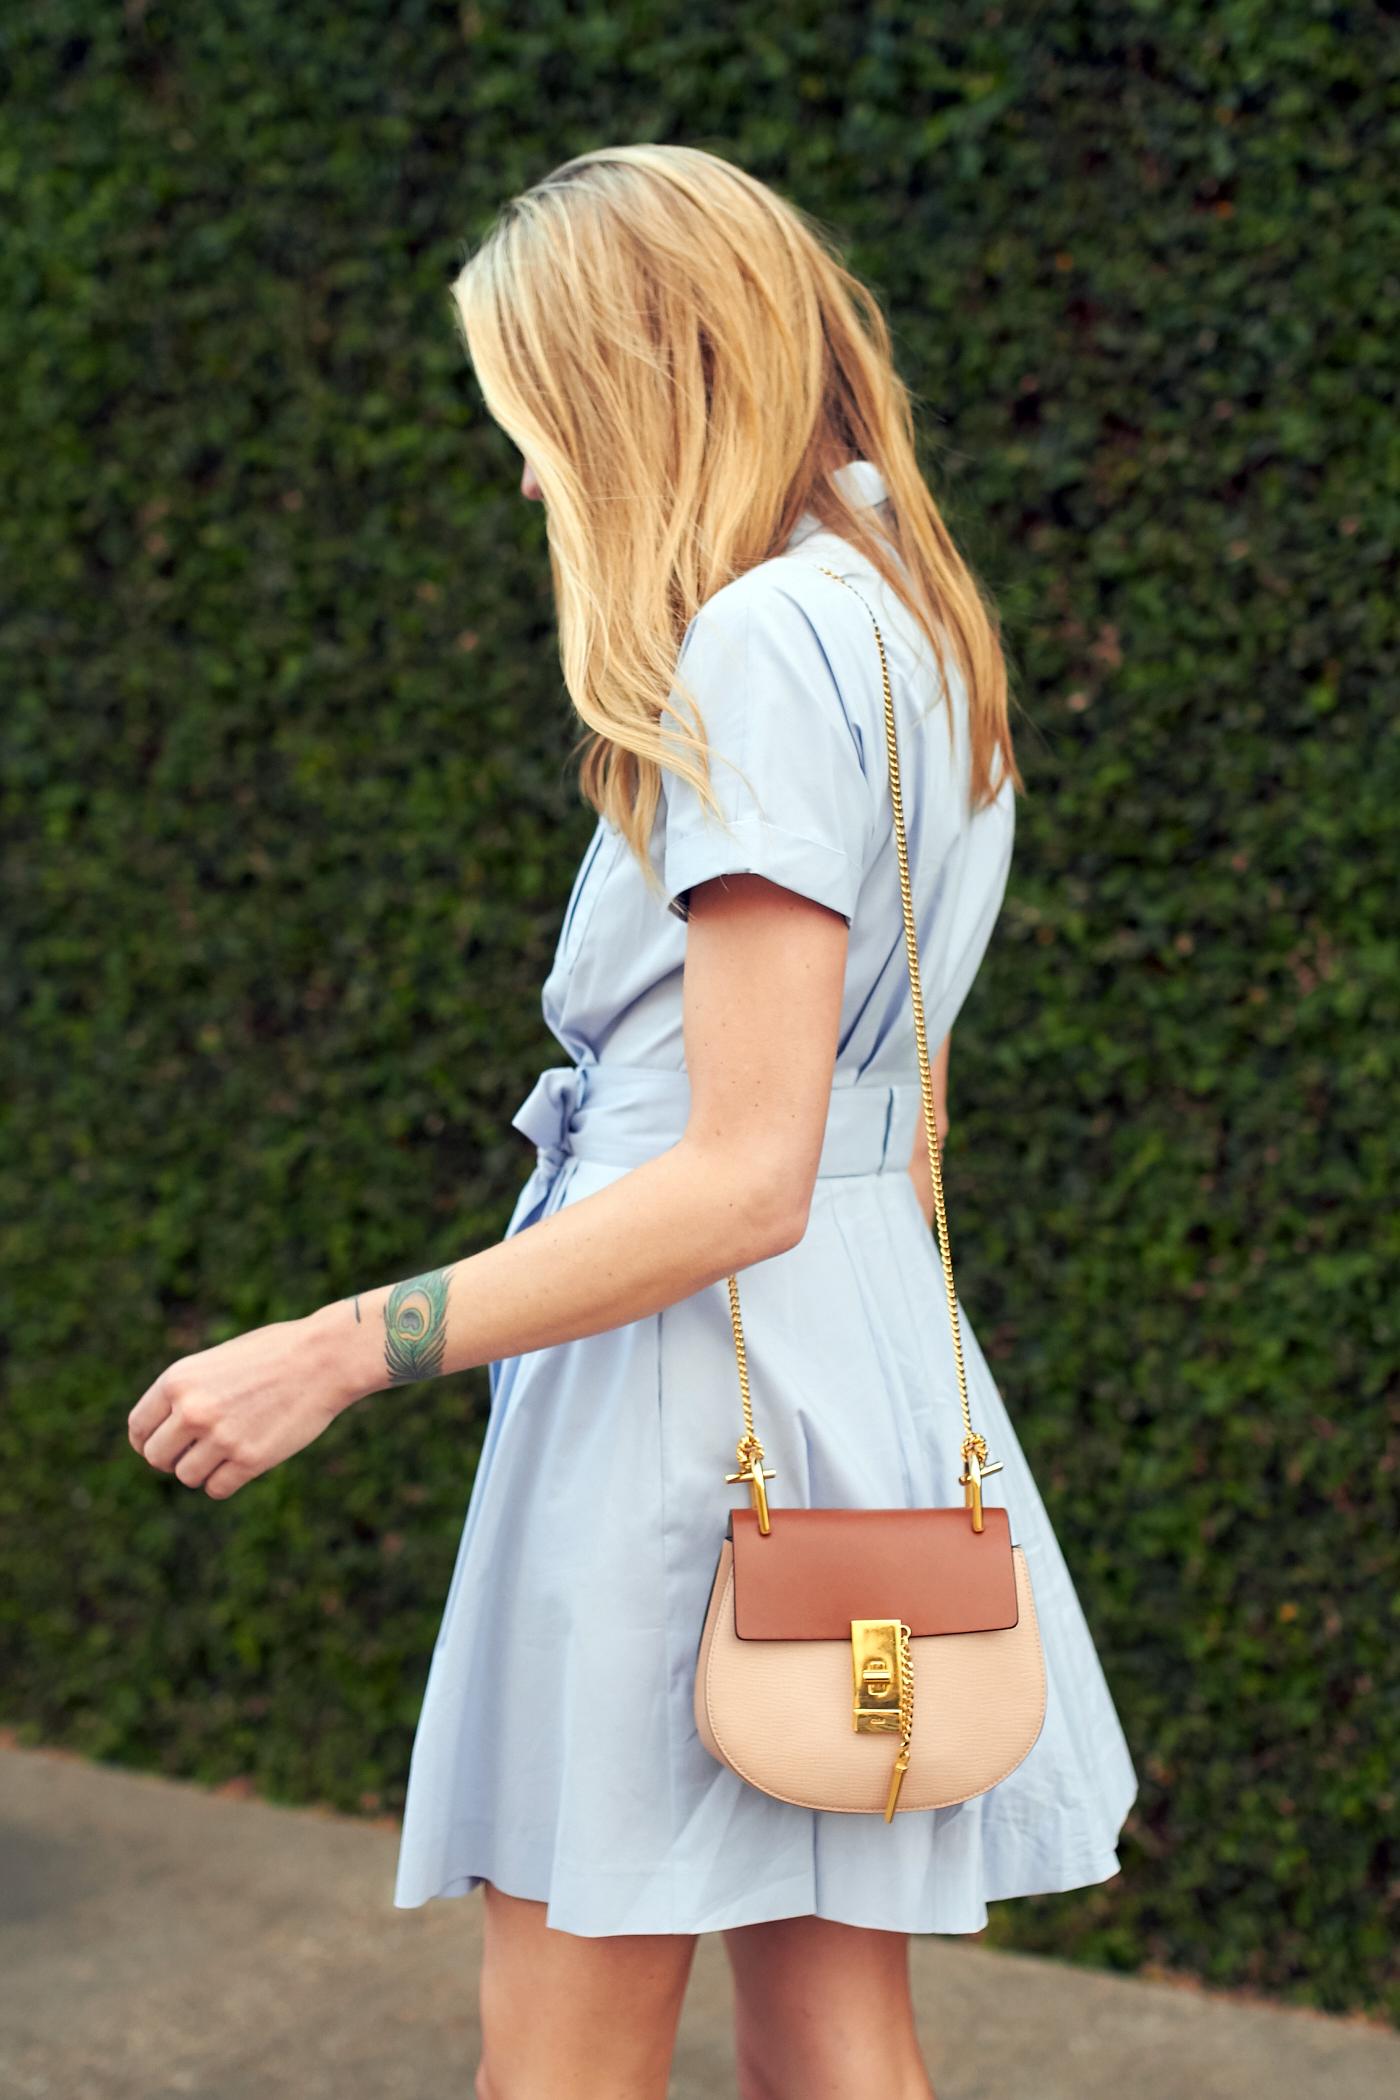 fashion-jackson-chloe-drew-handbag-nordstrom-blue-shirtdress